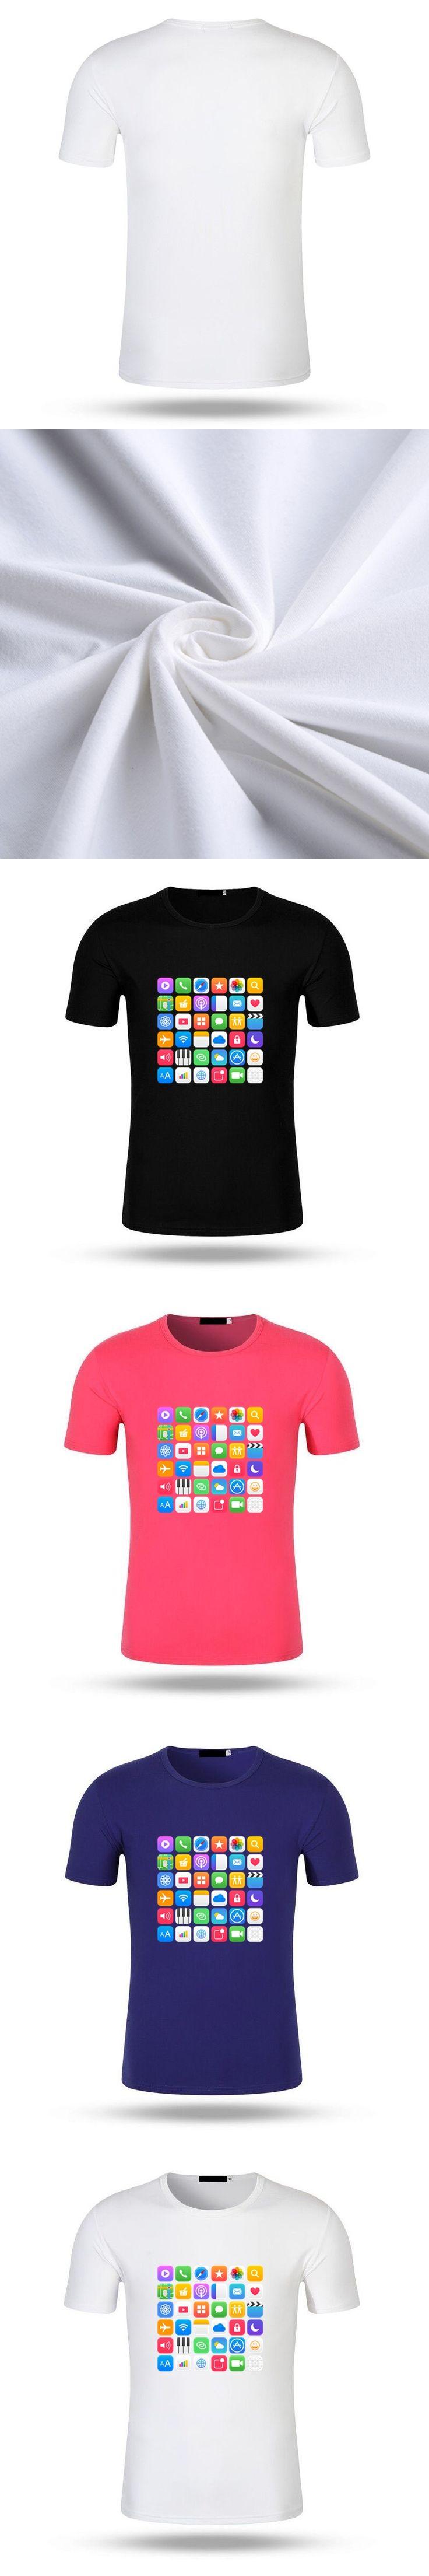 2017 Men Funny T Shirt Fashion Brand Print Phone Icon T-shirt Summer Short Sleeve Modal Cotton Tee Shirt Male Black Shirts